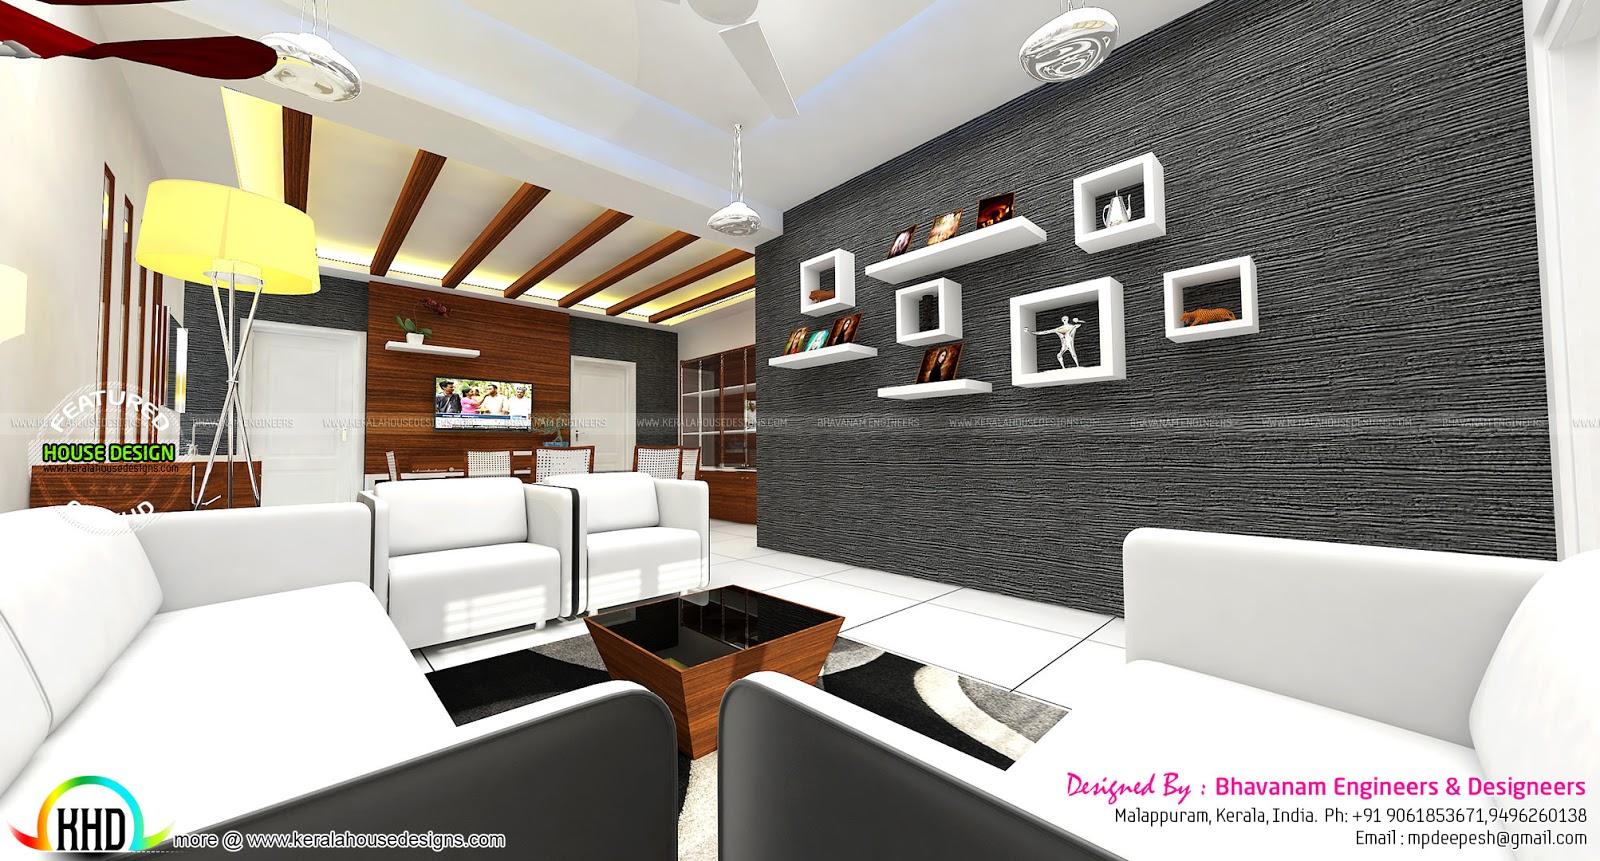 Living room interior decors ideas - Kerala home design and ...